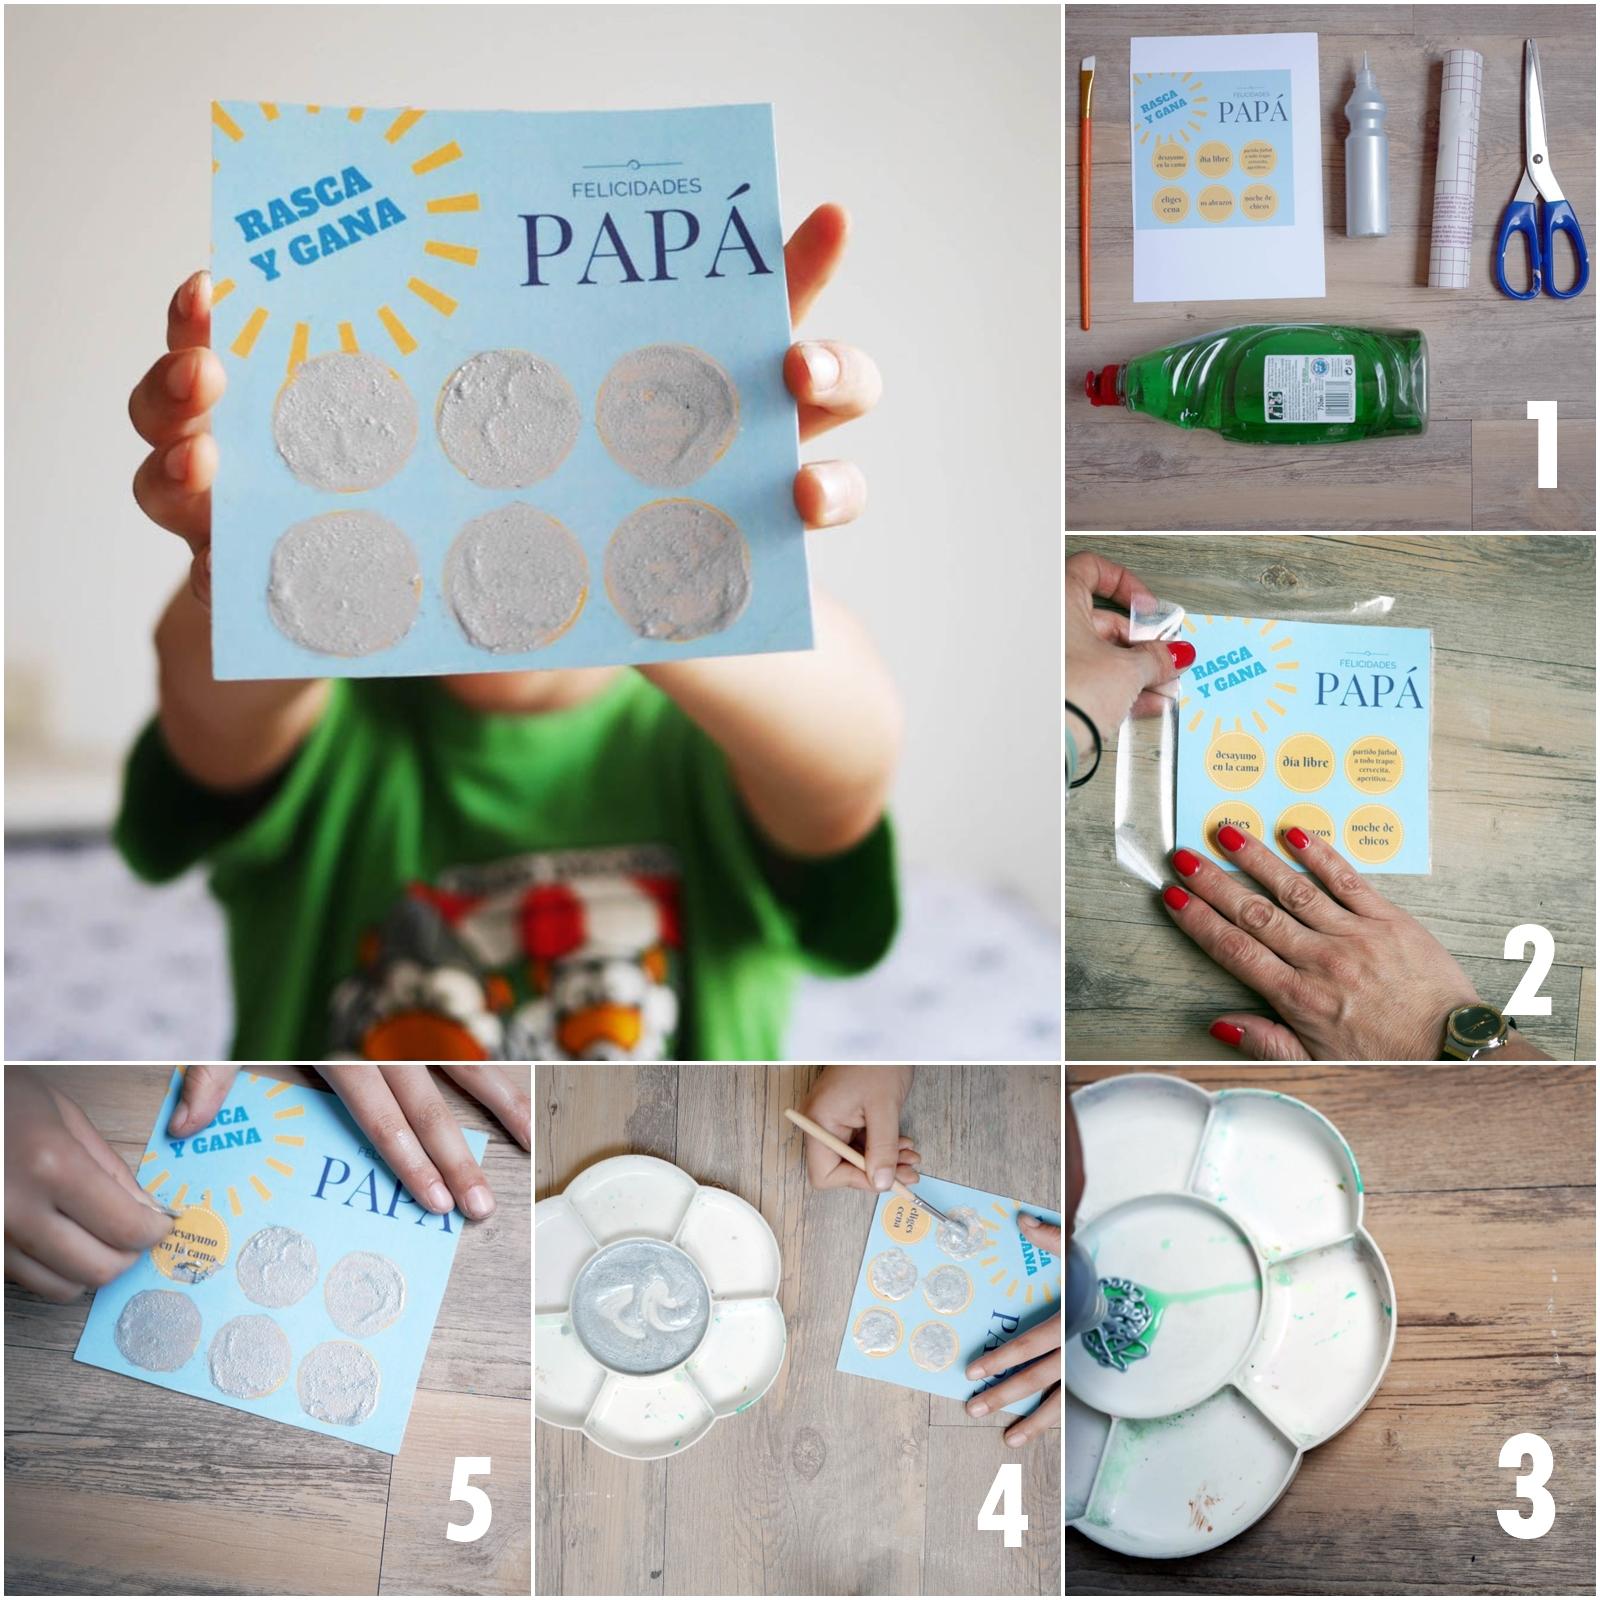 manualidades para el dia del padre paso a paso (2)